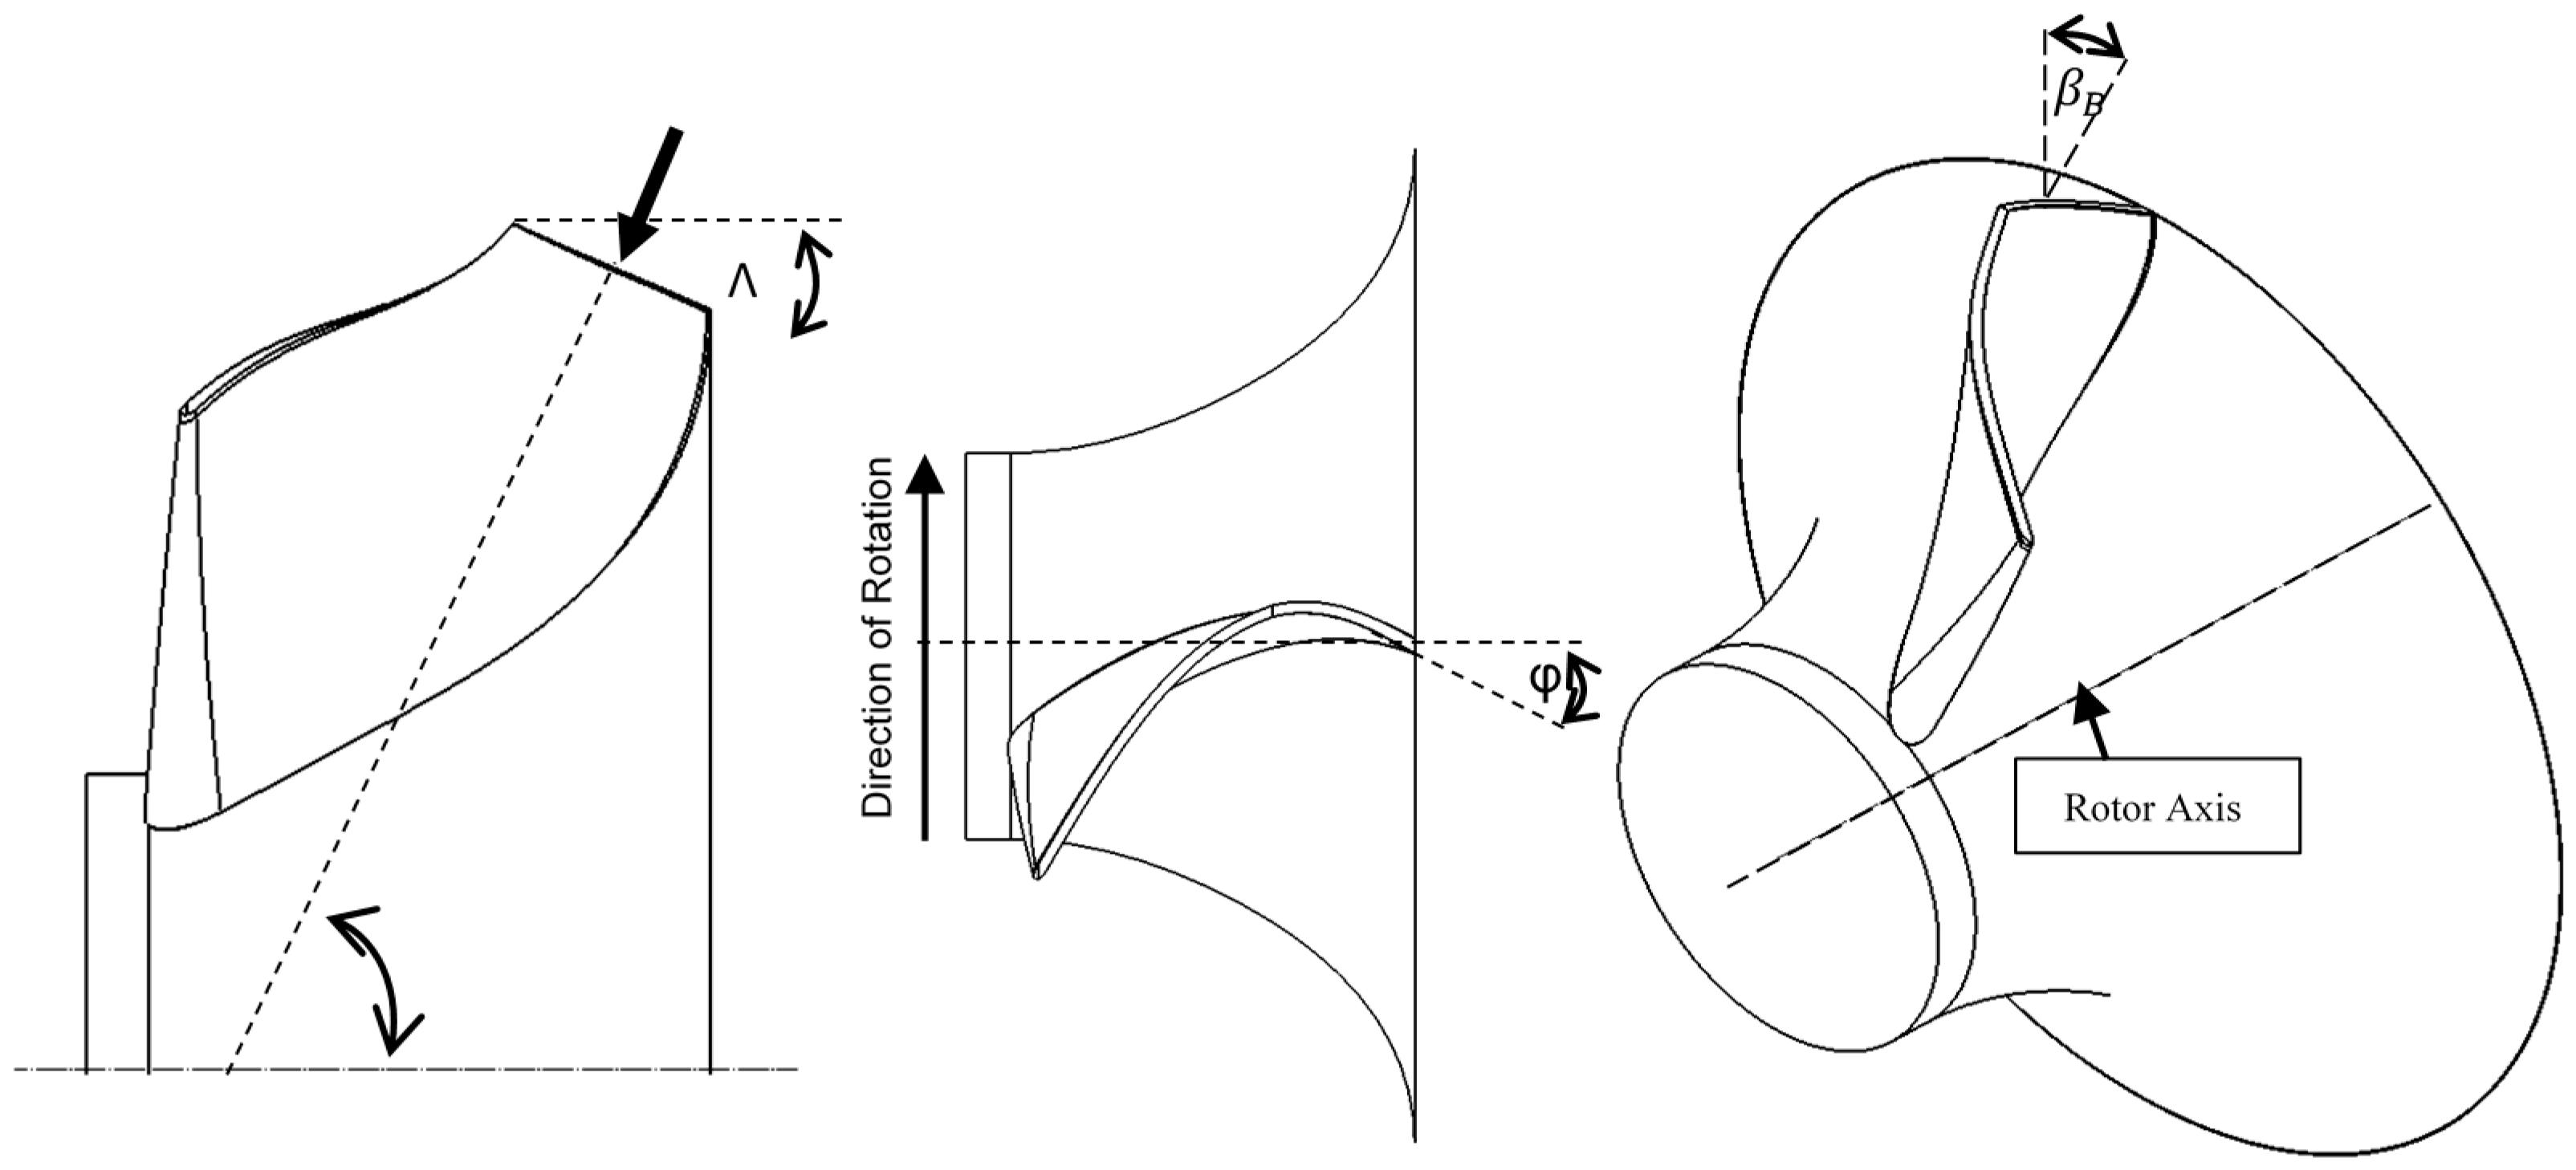 Toro Rain Sensor Irrigation Controller Wiring Diagram 0 Natebirdme Lawn Sprinkler System Interesting Orbit Contemporary